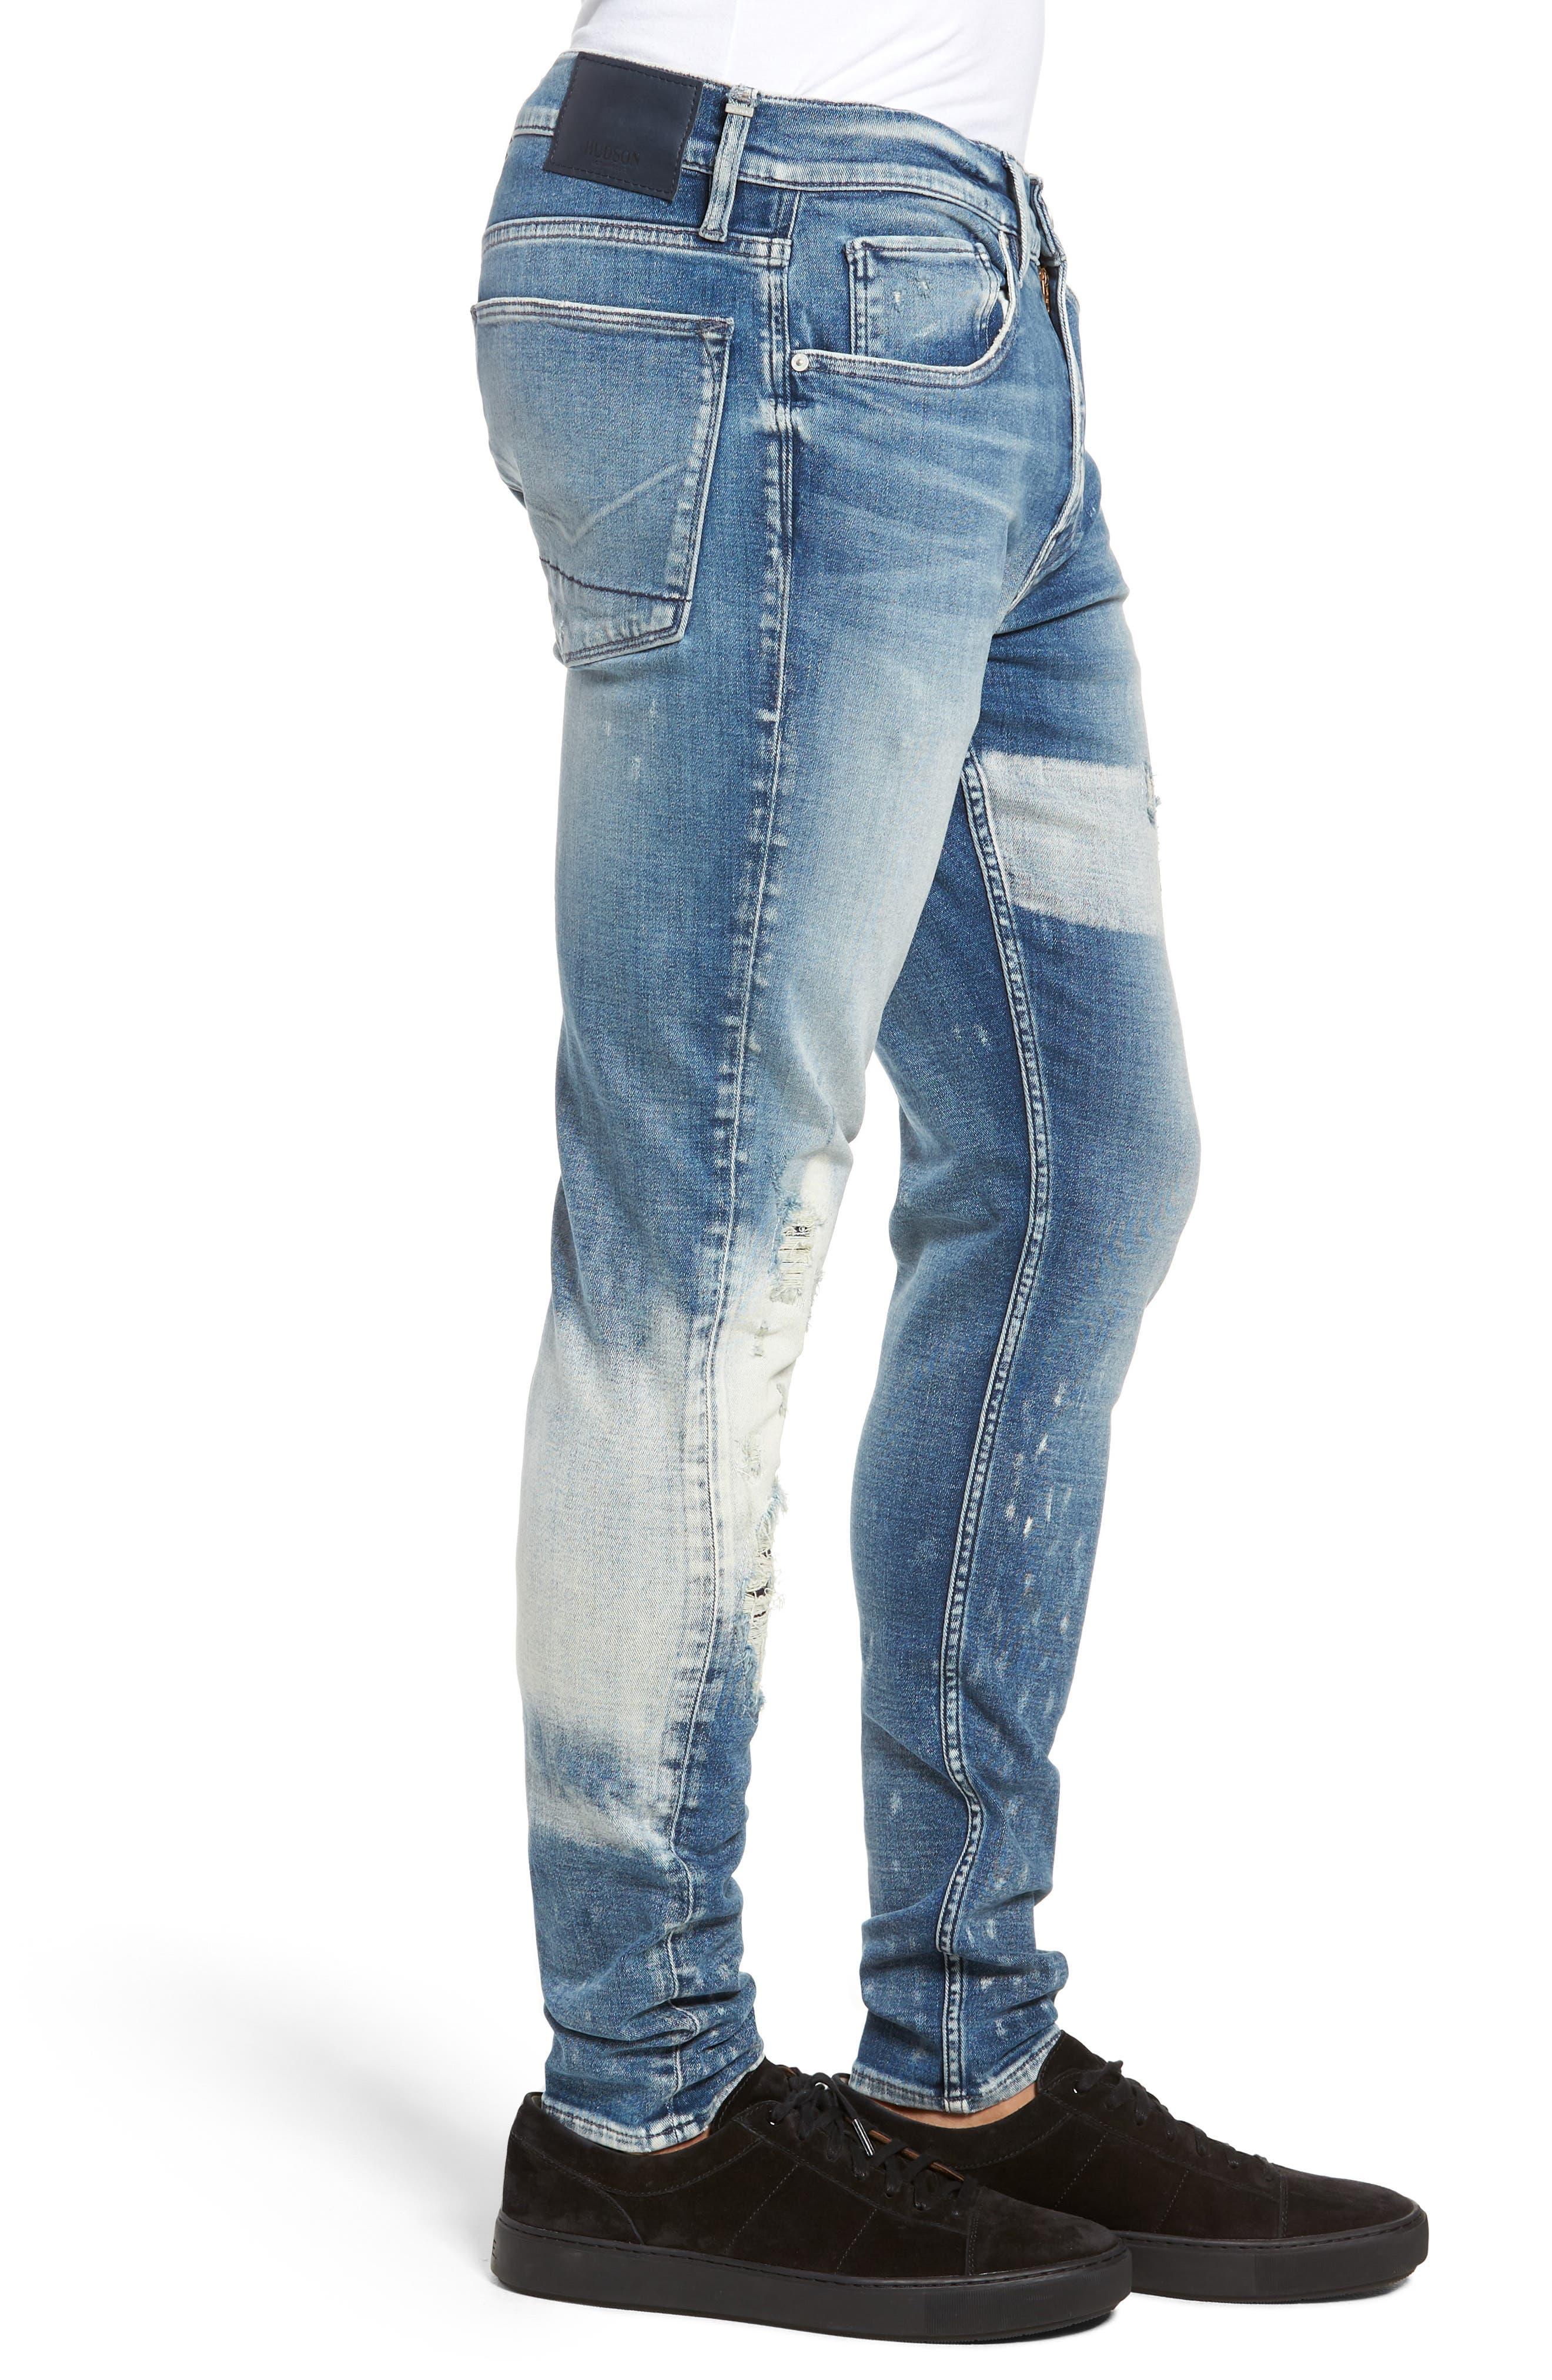 Zack Skinny Fit Jeans,                             Alternate thumbnail 3, color,                             MCNAB